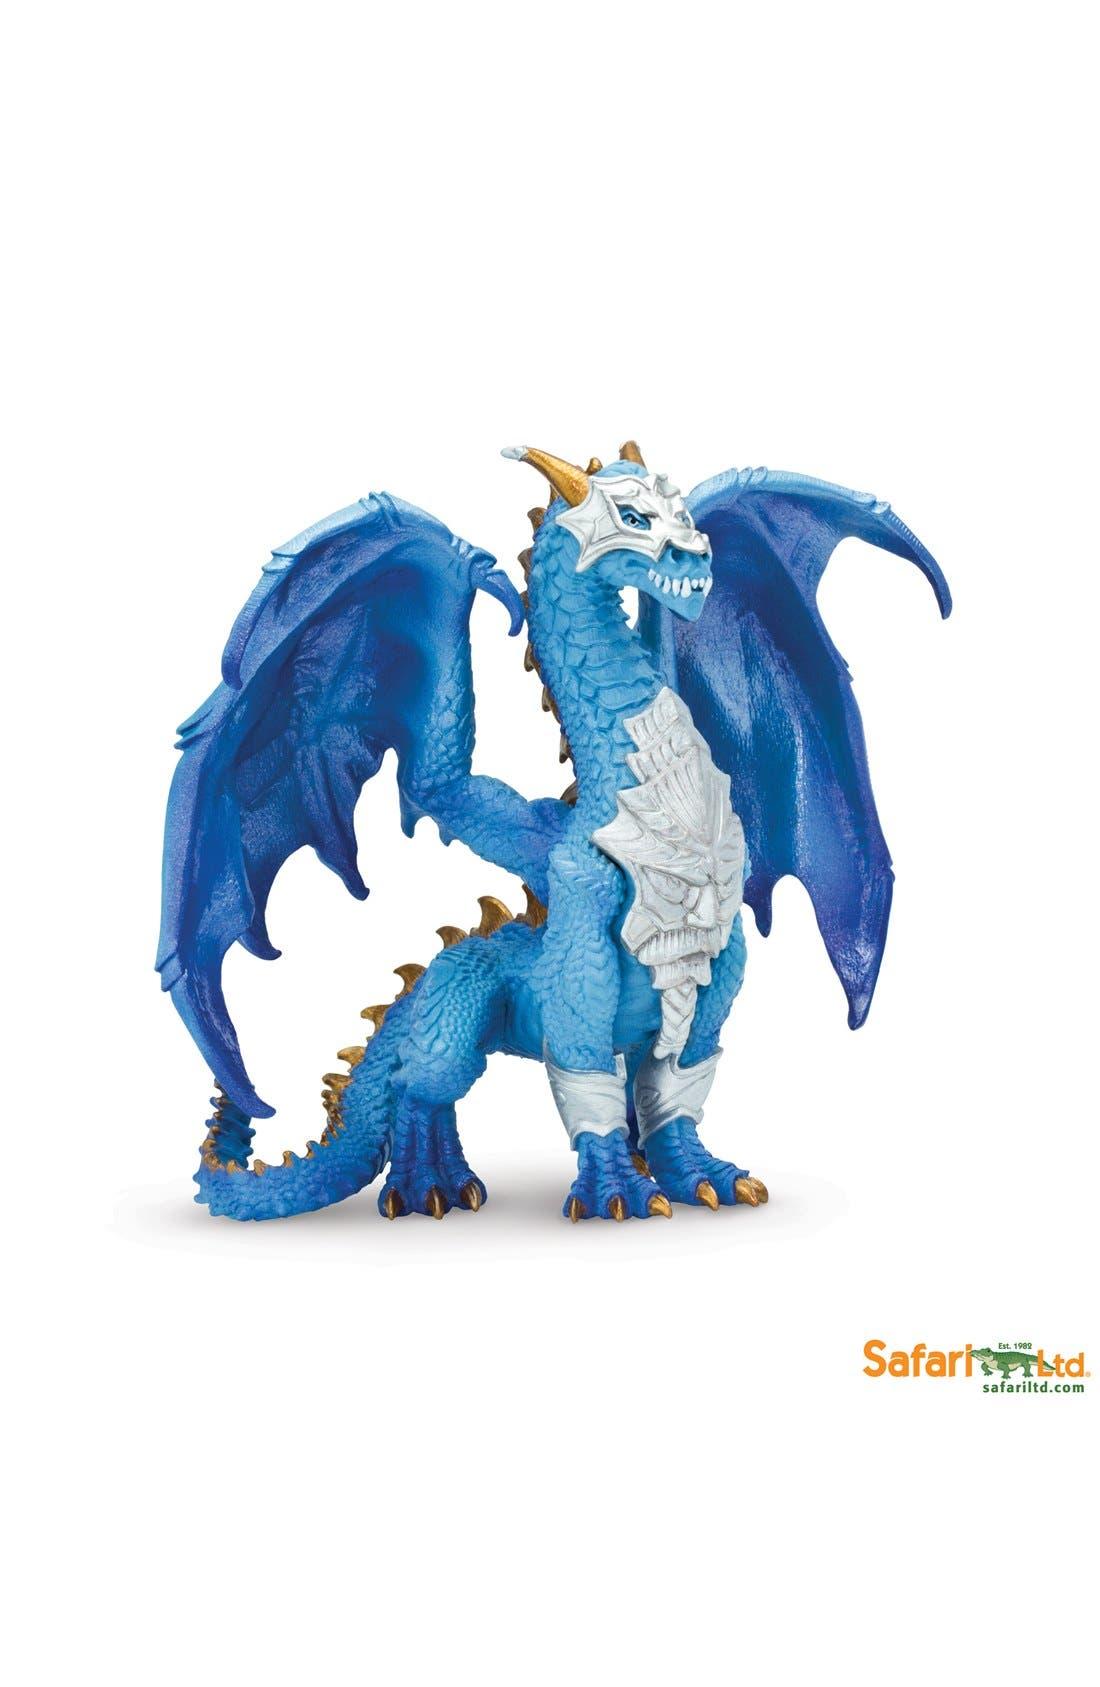 Main Image - Safari Ltd. Guardian Dragon Figurine